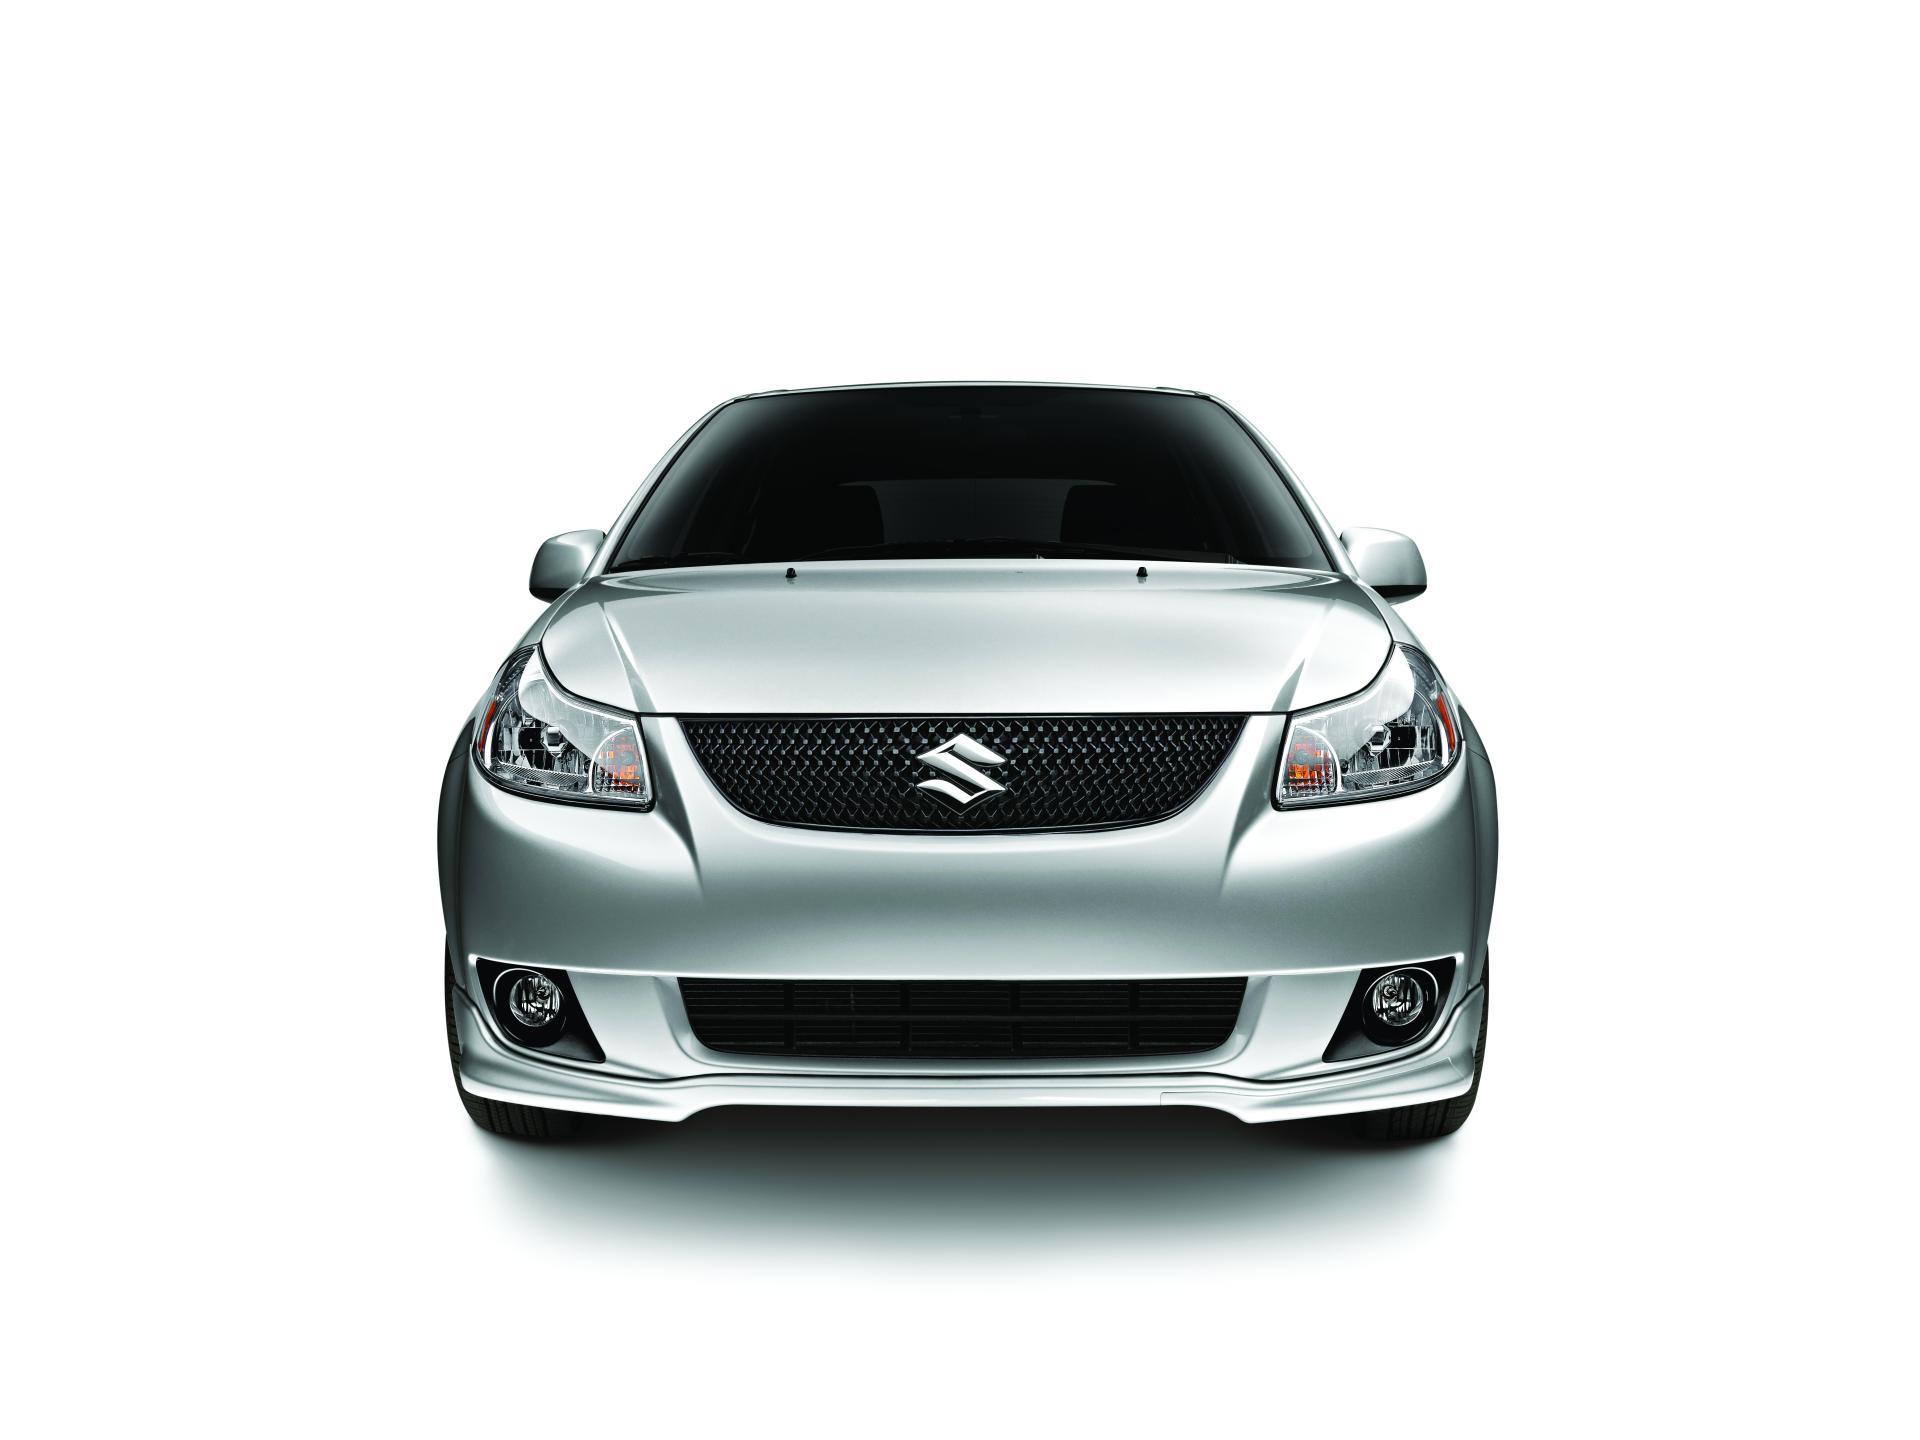 Suzuki Sx Sedan Image on Convertible Crossover 2012